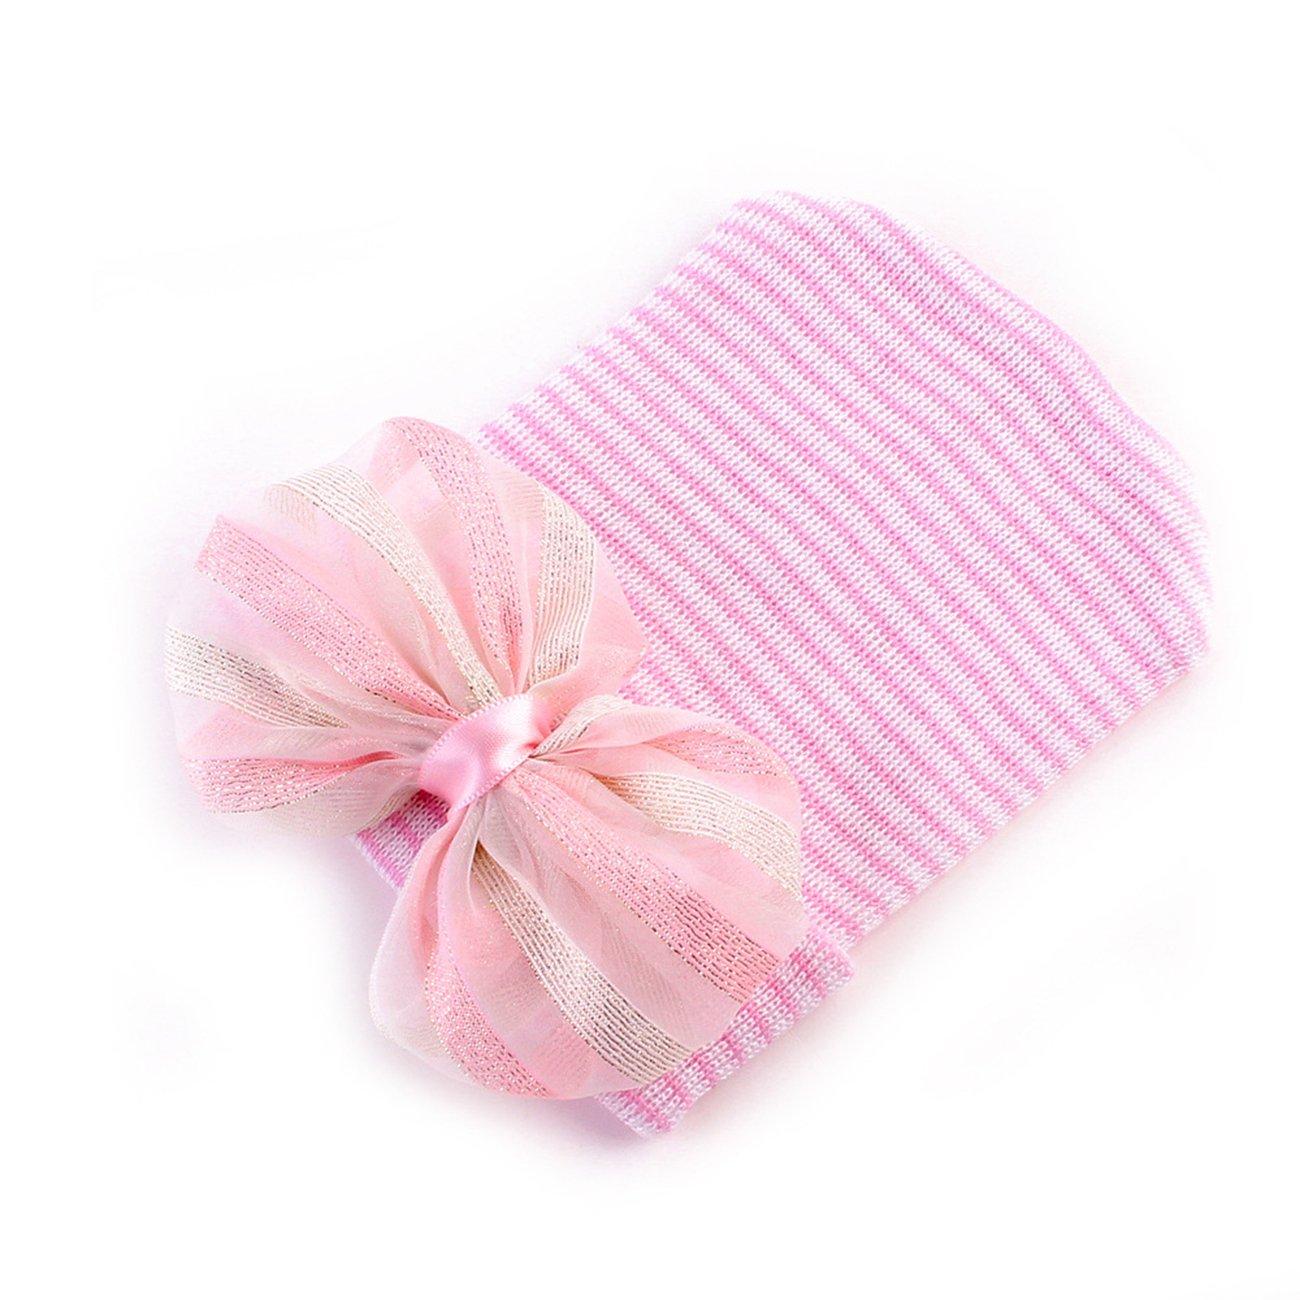 da23941c8fa DRESHOW BQUBO Newborn Hospital Hat Infant Baby Hat Cap with Big Bow Soft  Cute Knot Nursery larger image